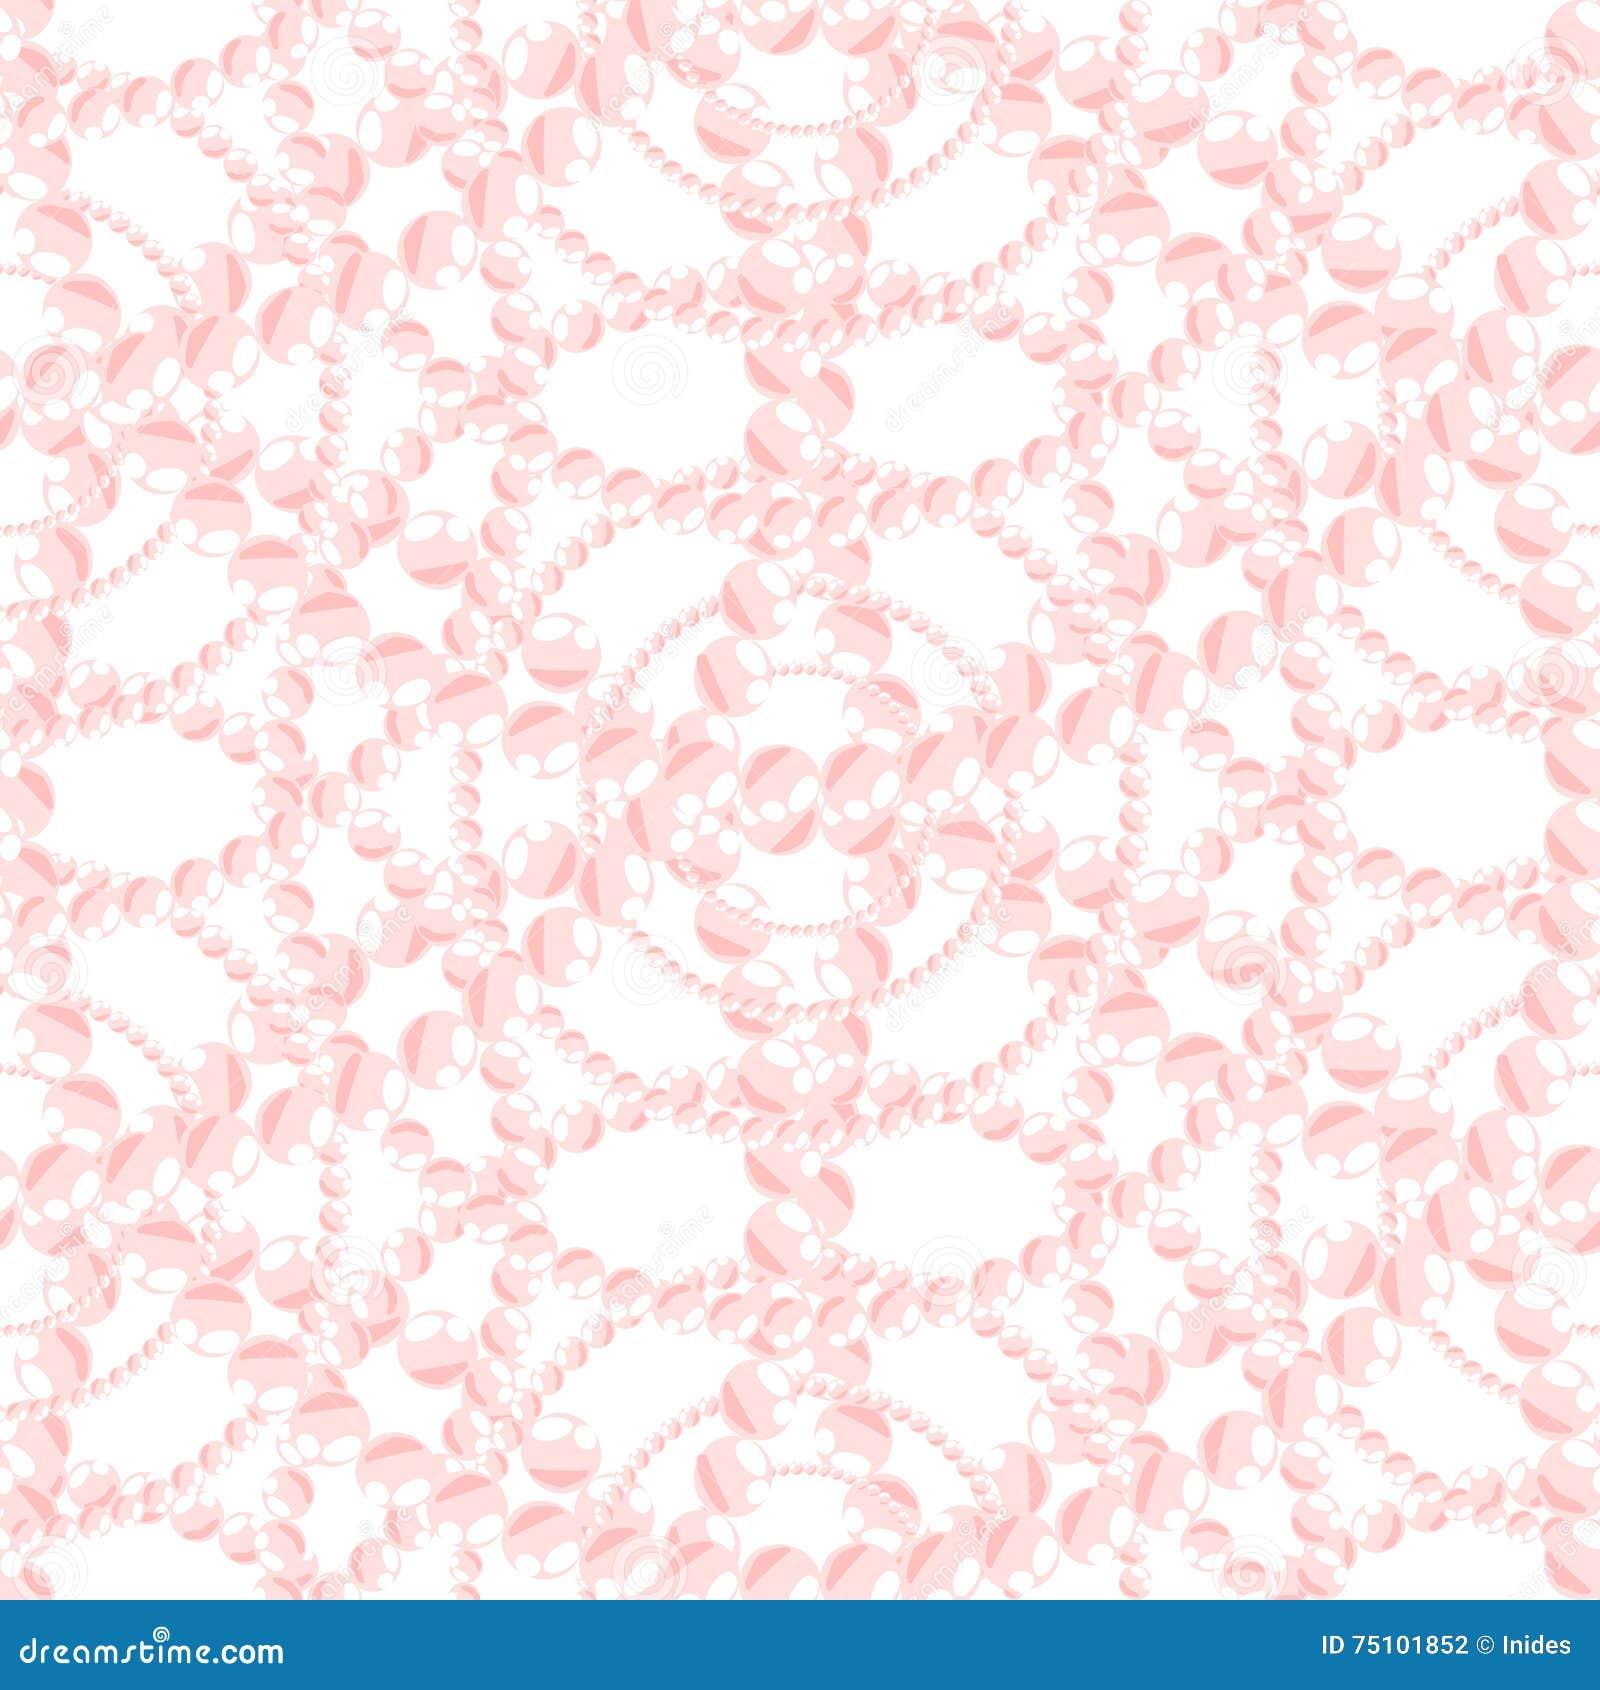 Nacreous pearl pink jewelry seamless pattern.